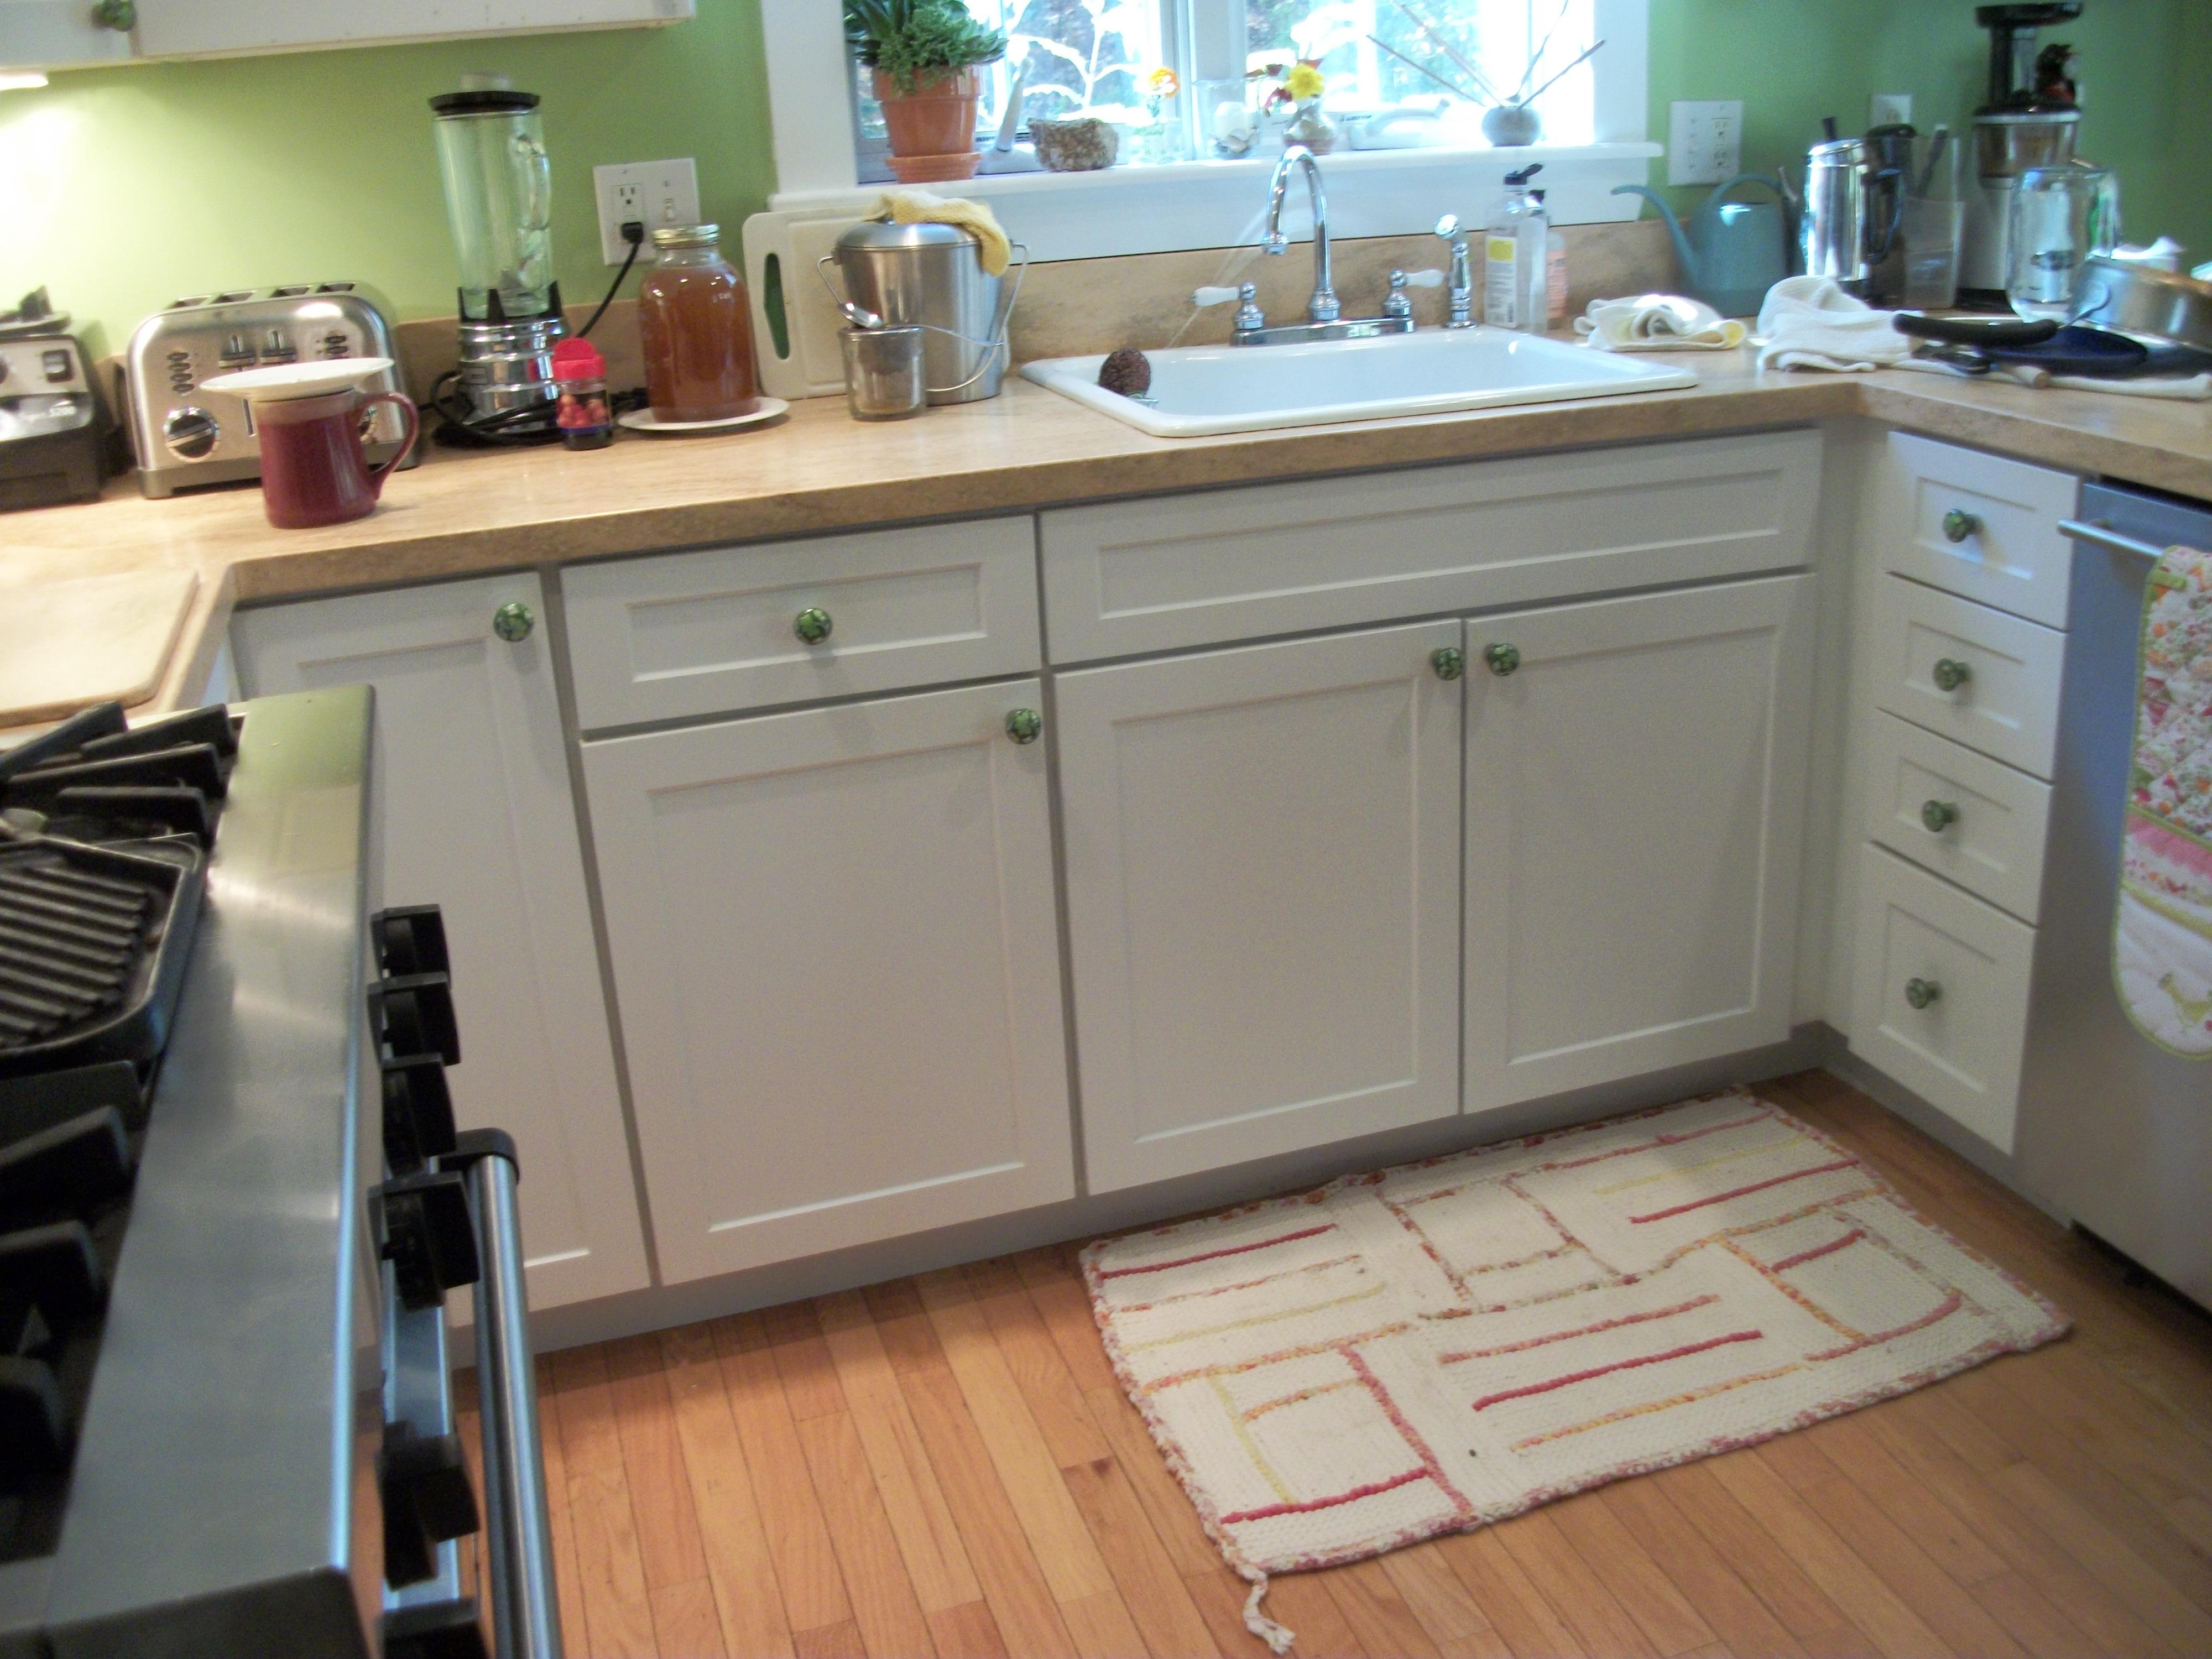 Kitchen Cabinet Hardware Los Angeles - Nagpurentrepreneurs